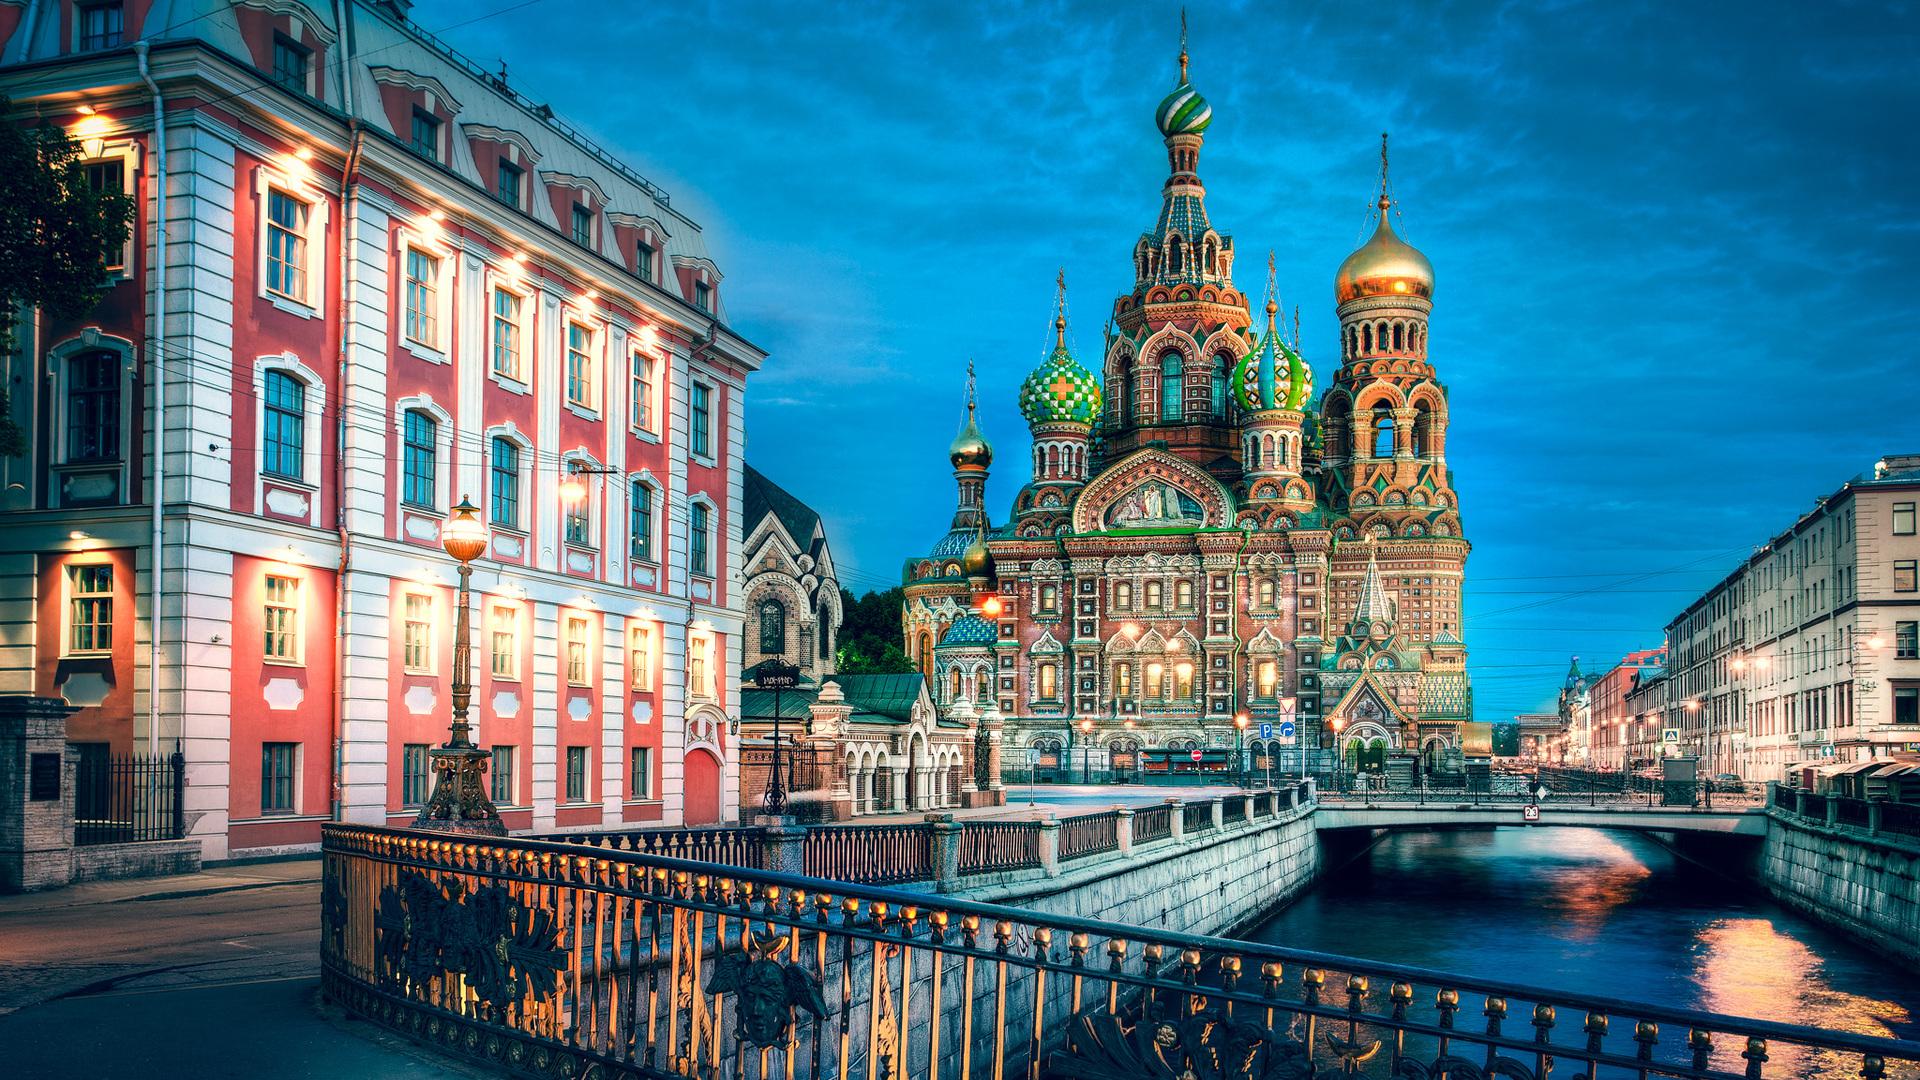 003 Saint Petersbourg - Russia